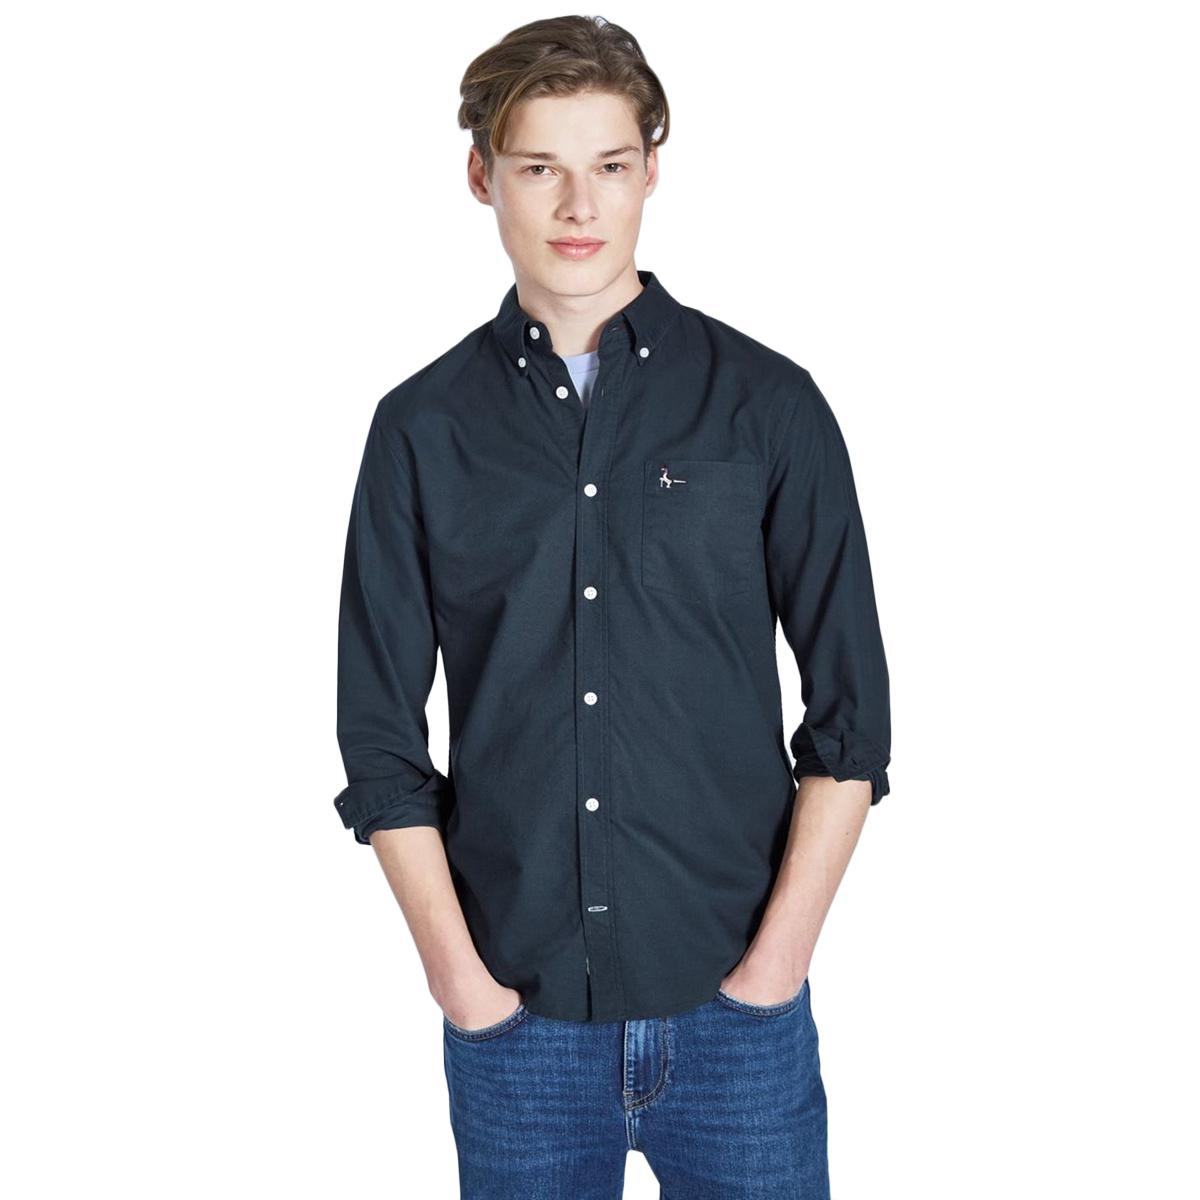 Jack Wills Men's Wadsworth Plain Oxford Shirt - Black, L